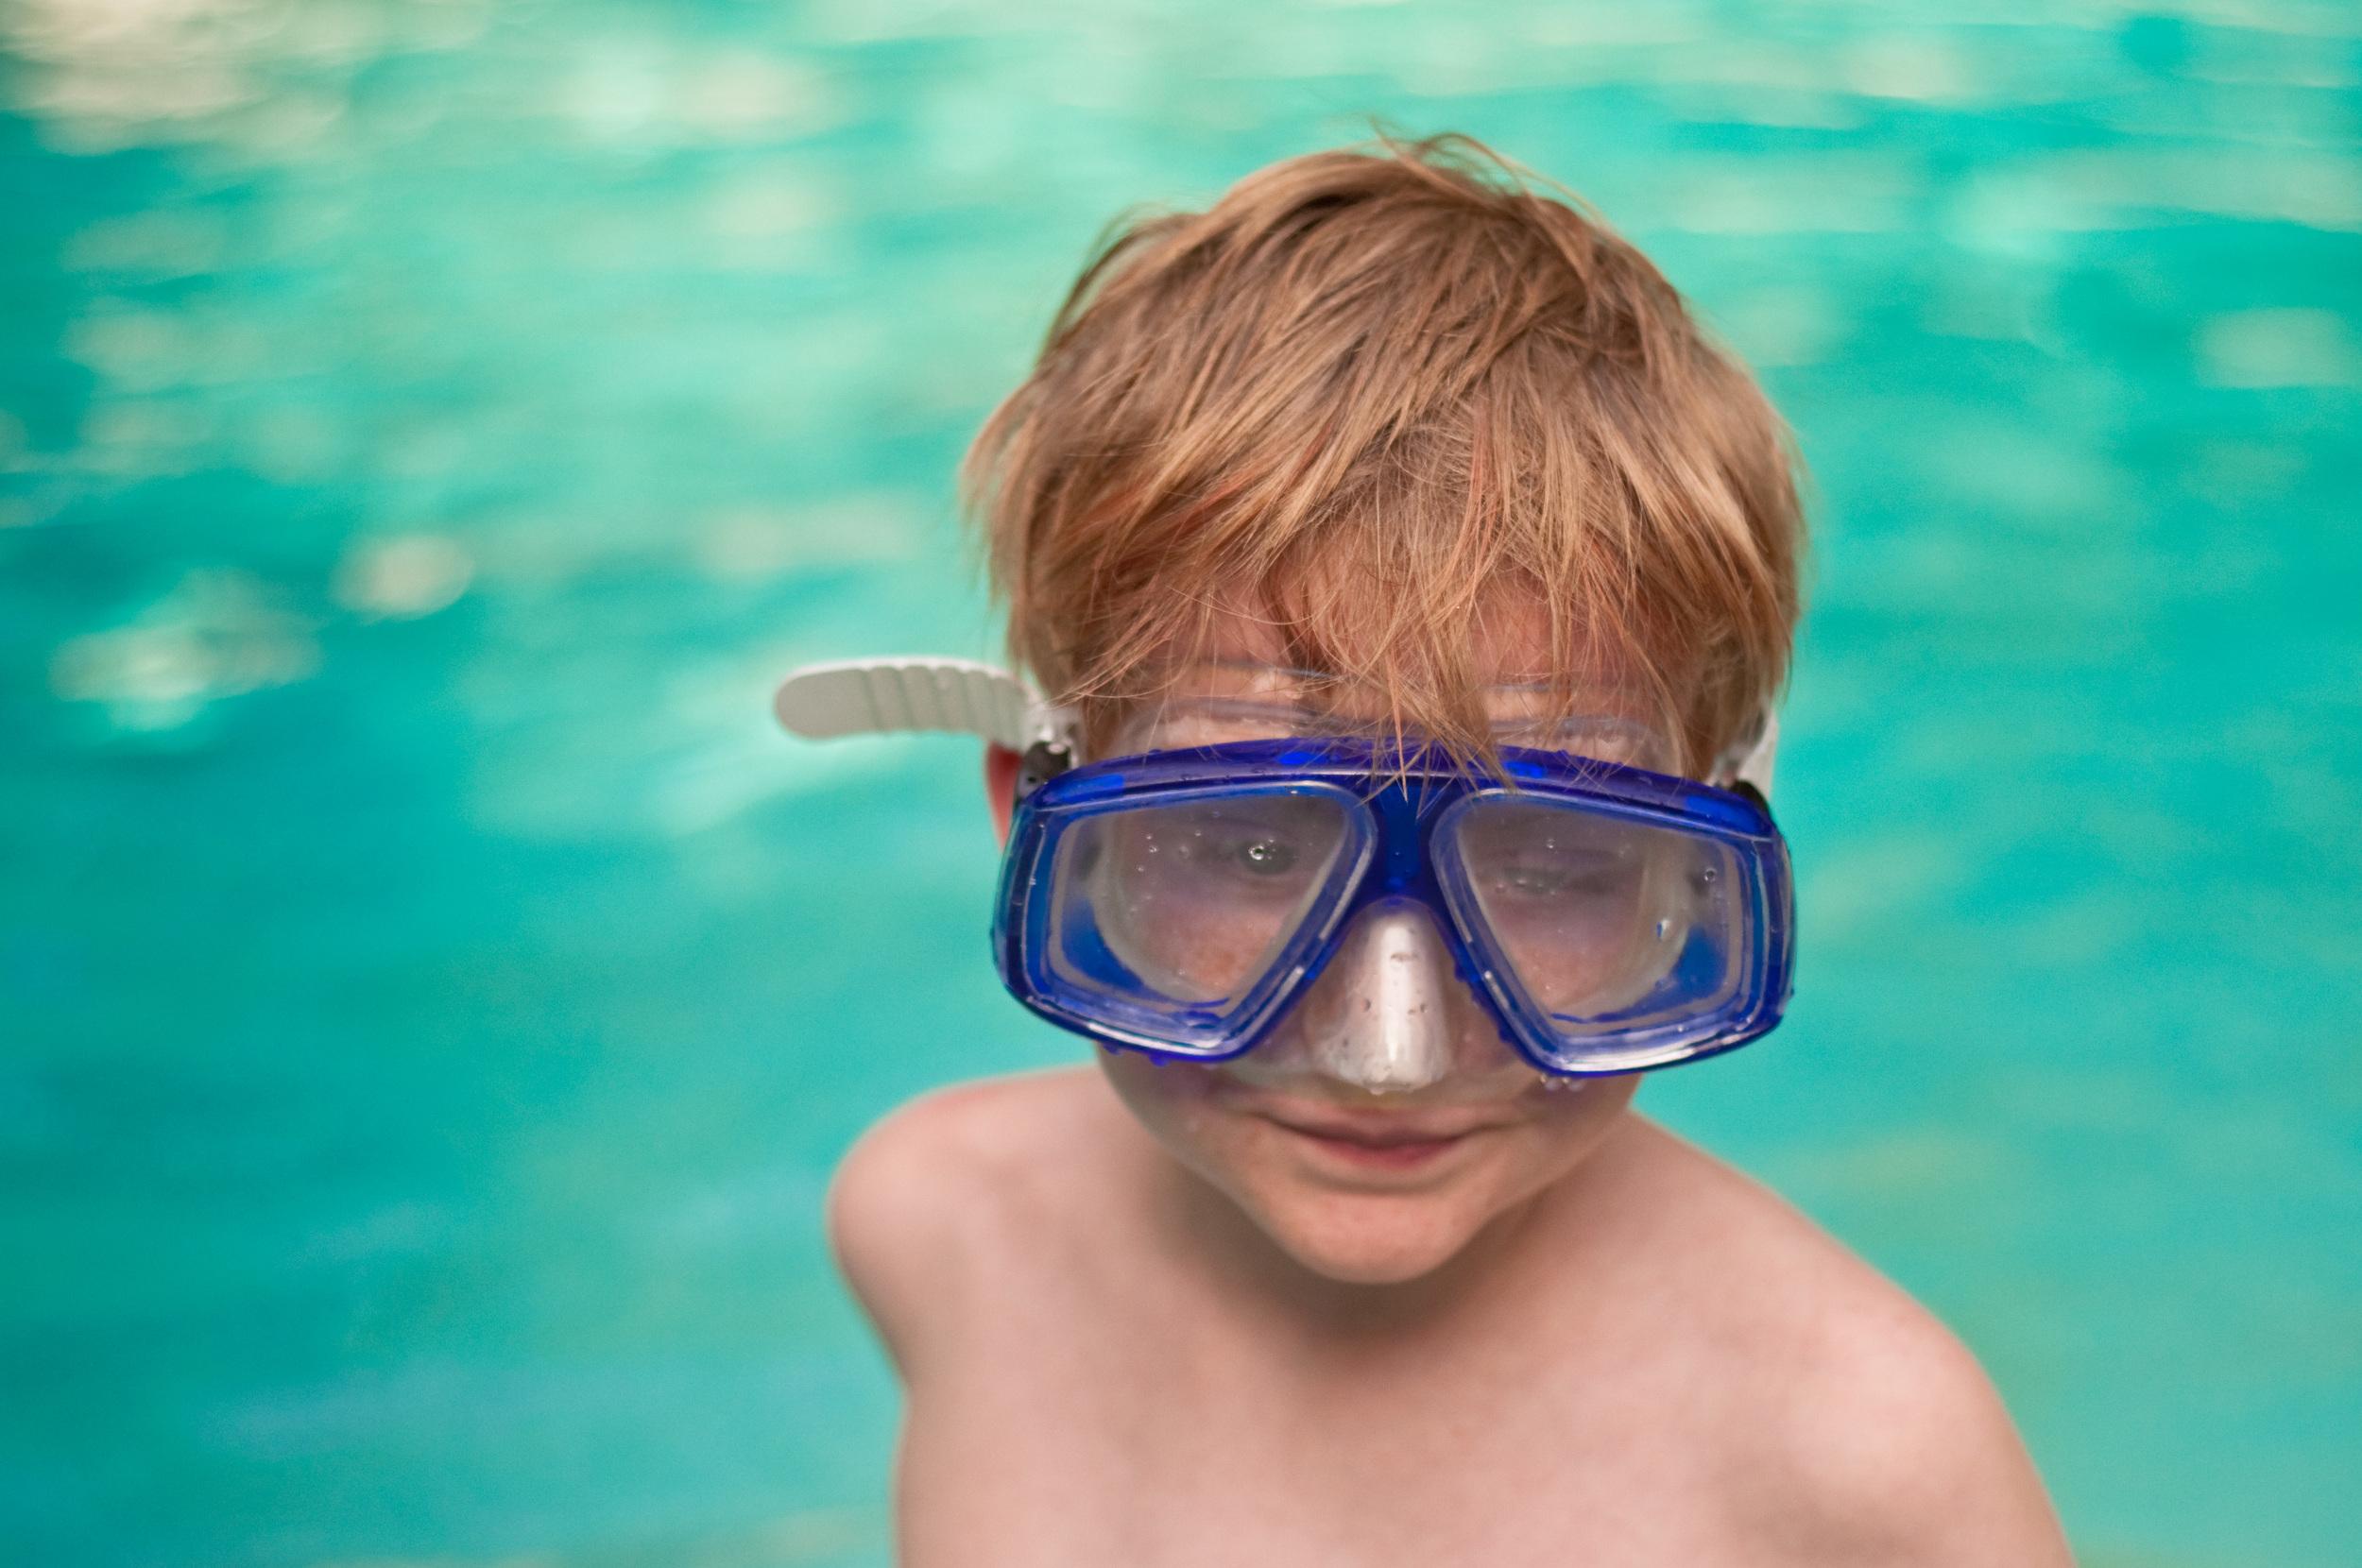 Pool side  - Nikon D90, Nikkor 50mm, ISO 250, f/2.5, 1/1600 sec